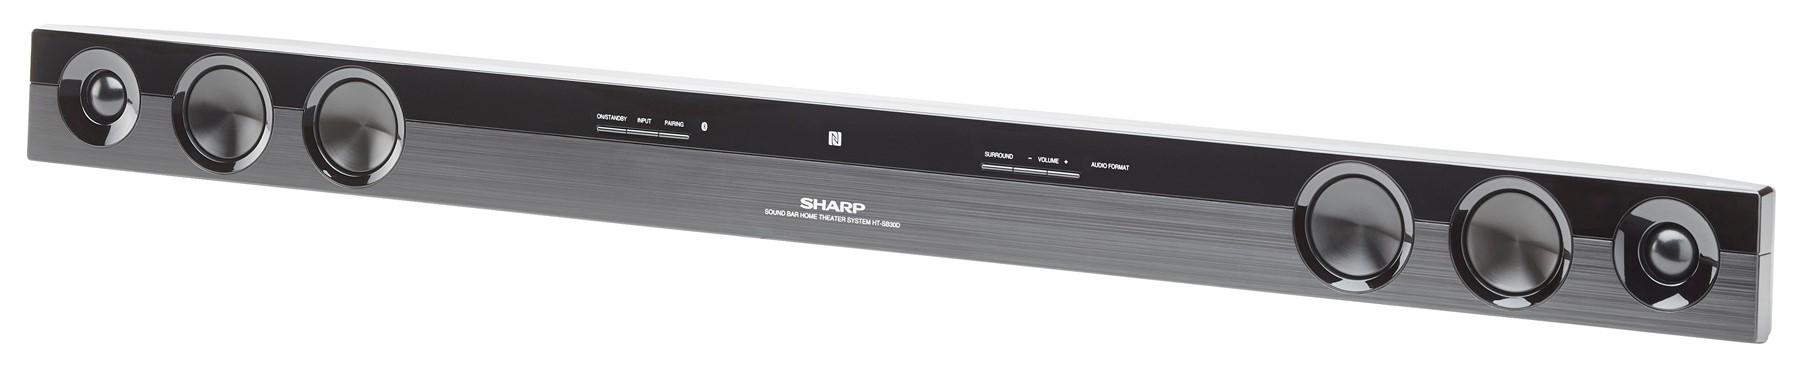 SHARP Surround Sound Speakers & System HT-SB30D